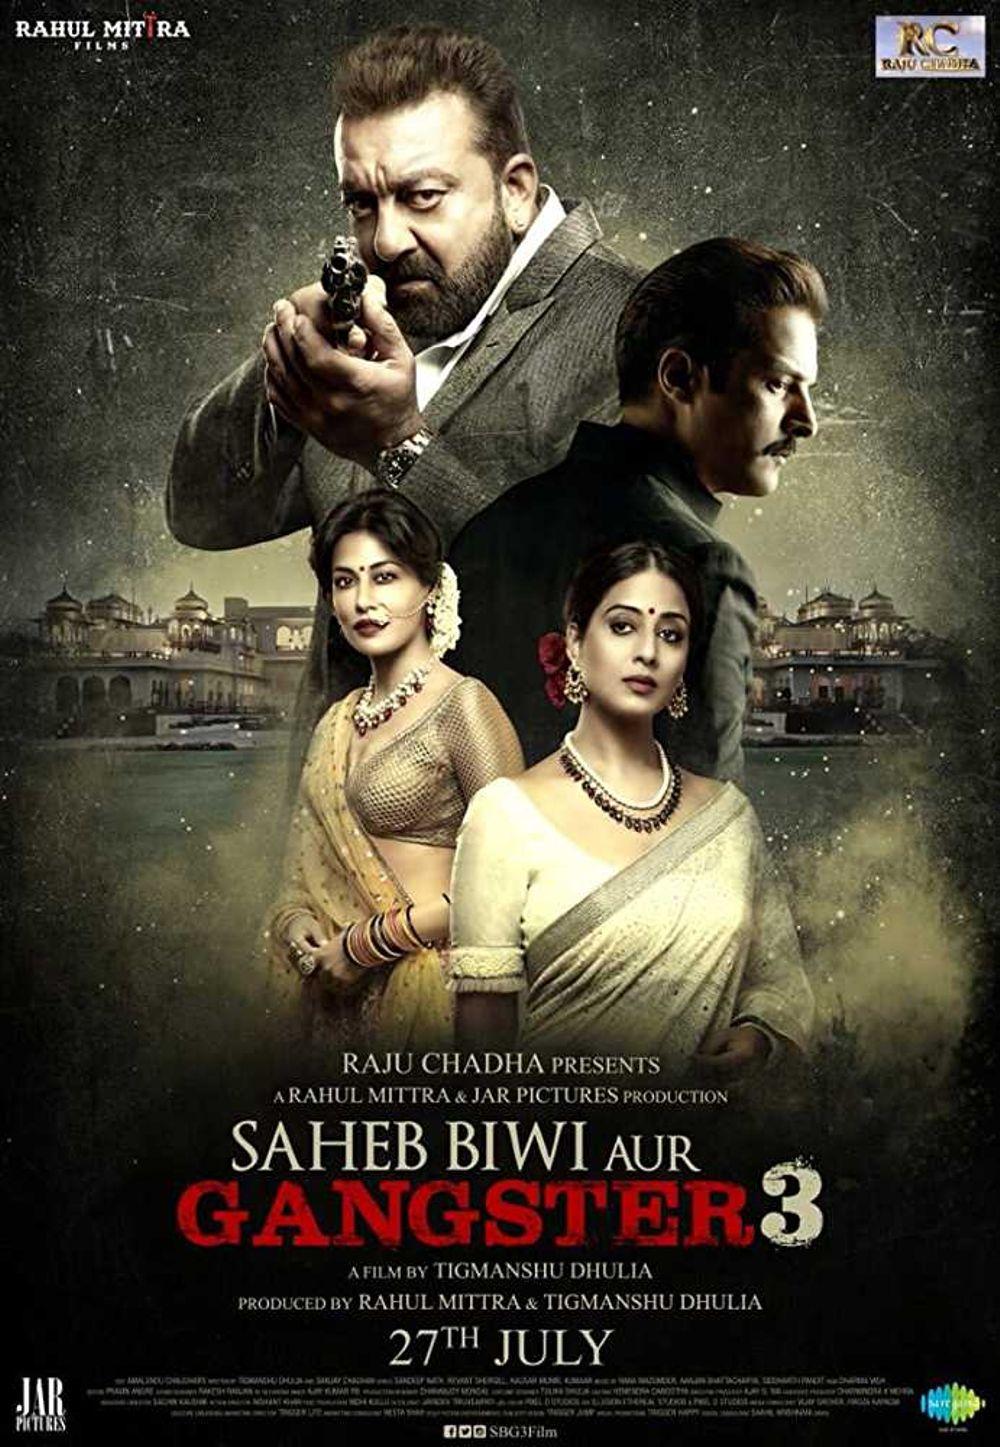 Saheb Biwi Aur Gangster 3 Movie Review